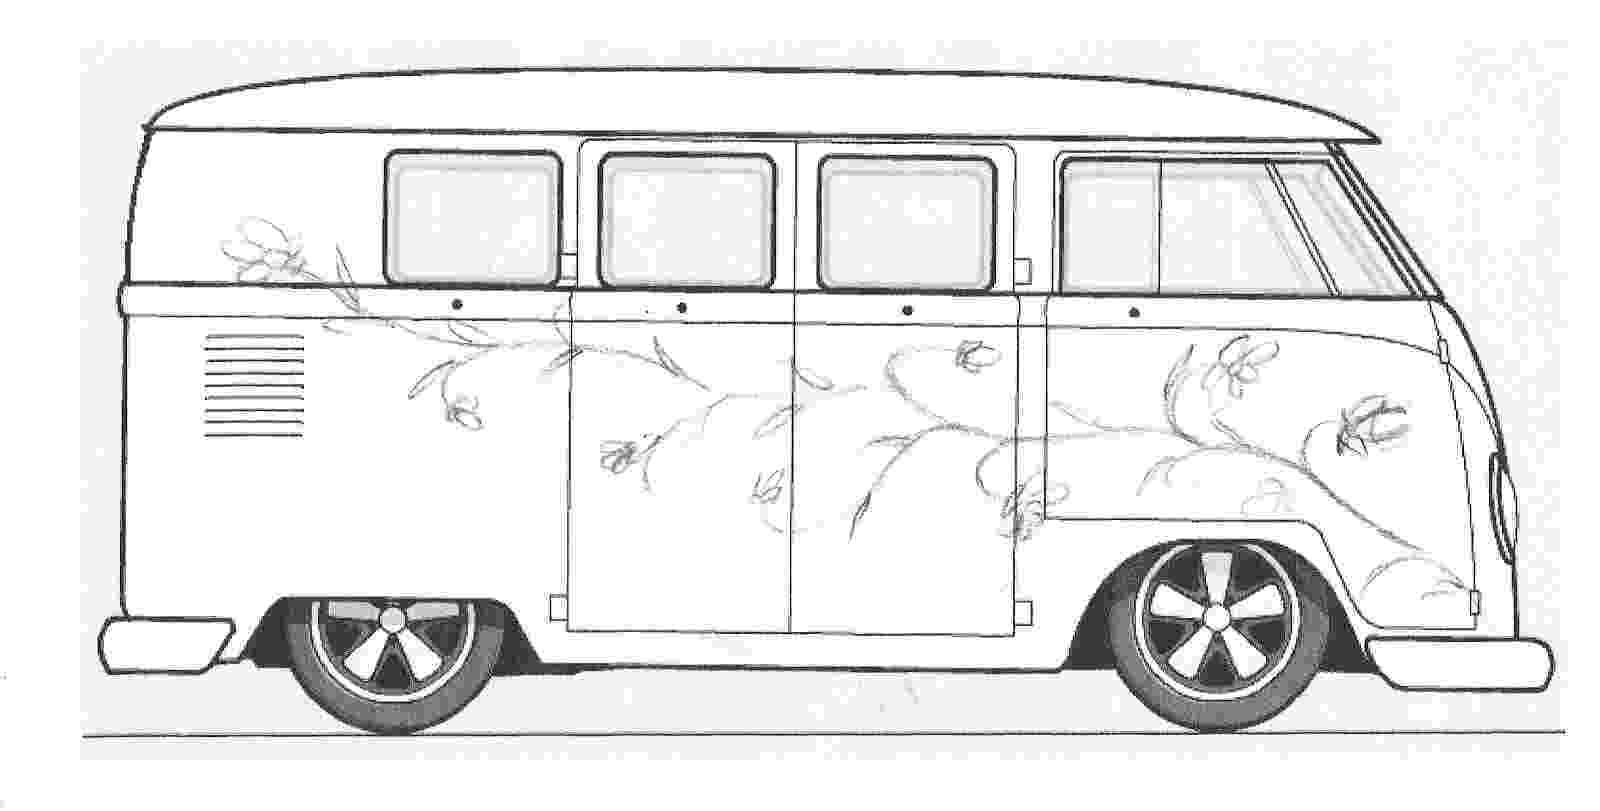 vw bus sketch vw bus tekening google zoeken volkswagen Ötletek sketch vw bus